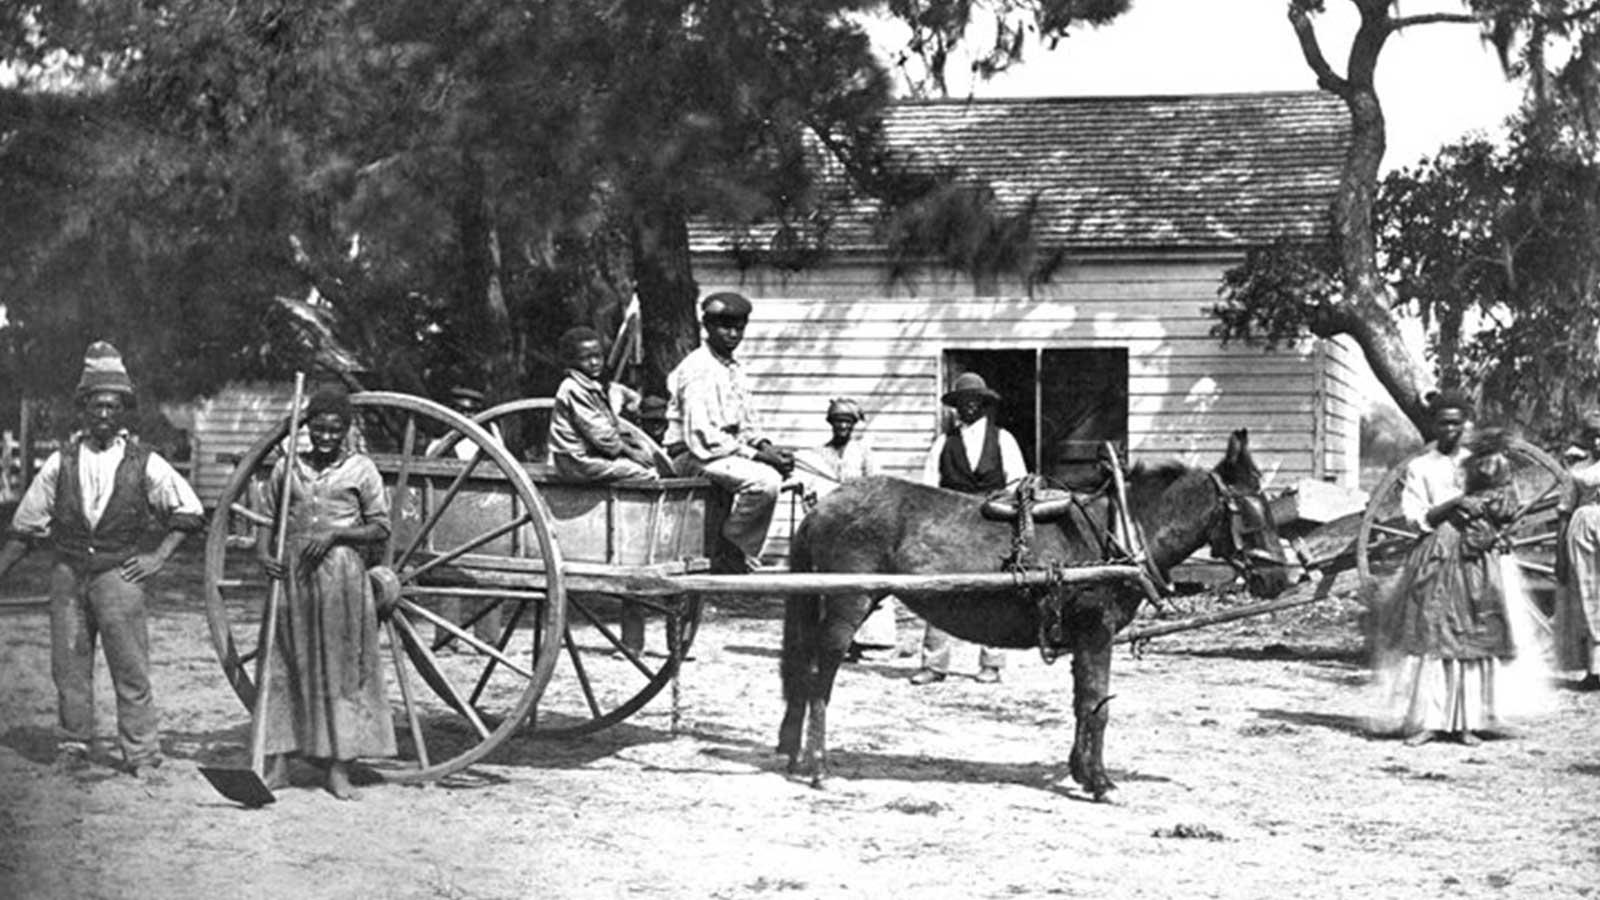 Slaves on Edisto Island, South Carolina in 1862